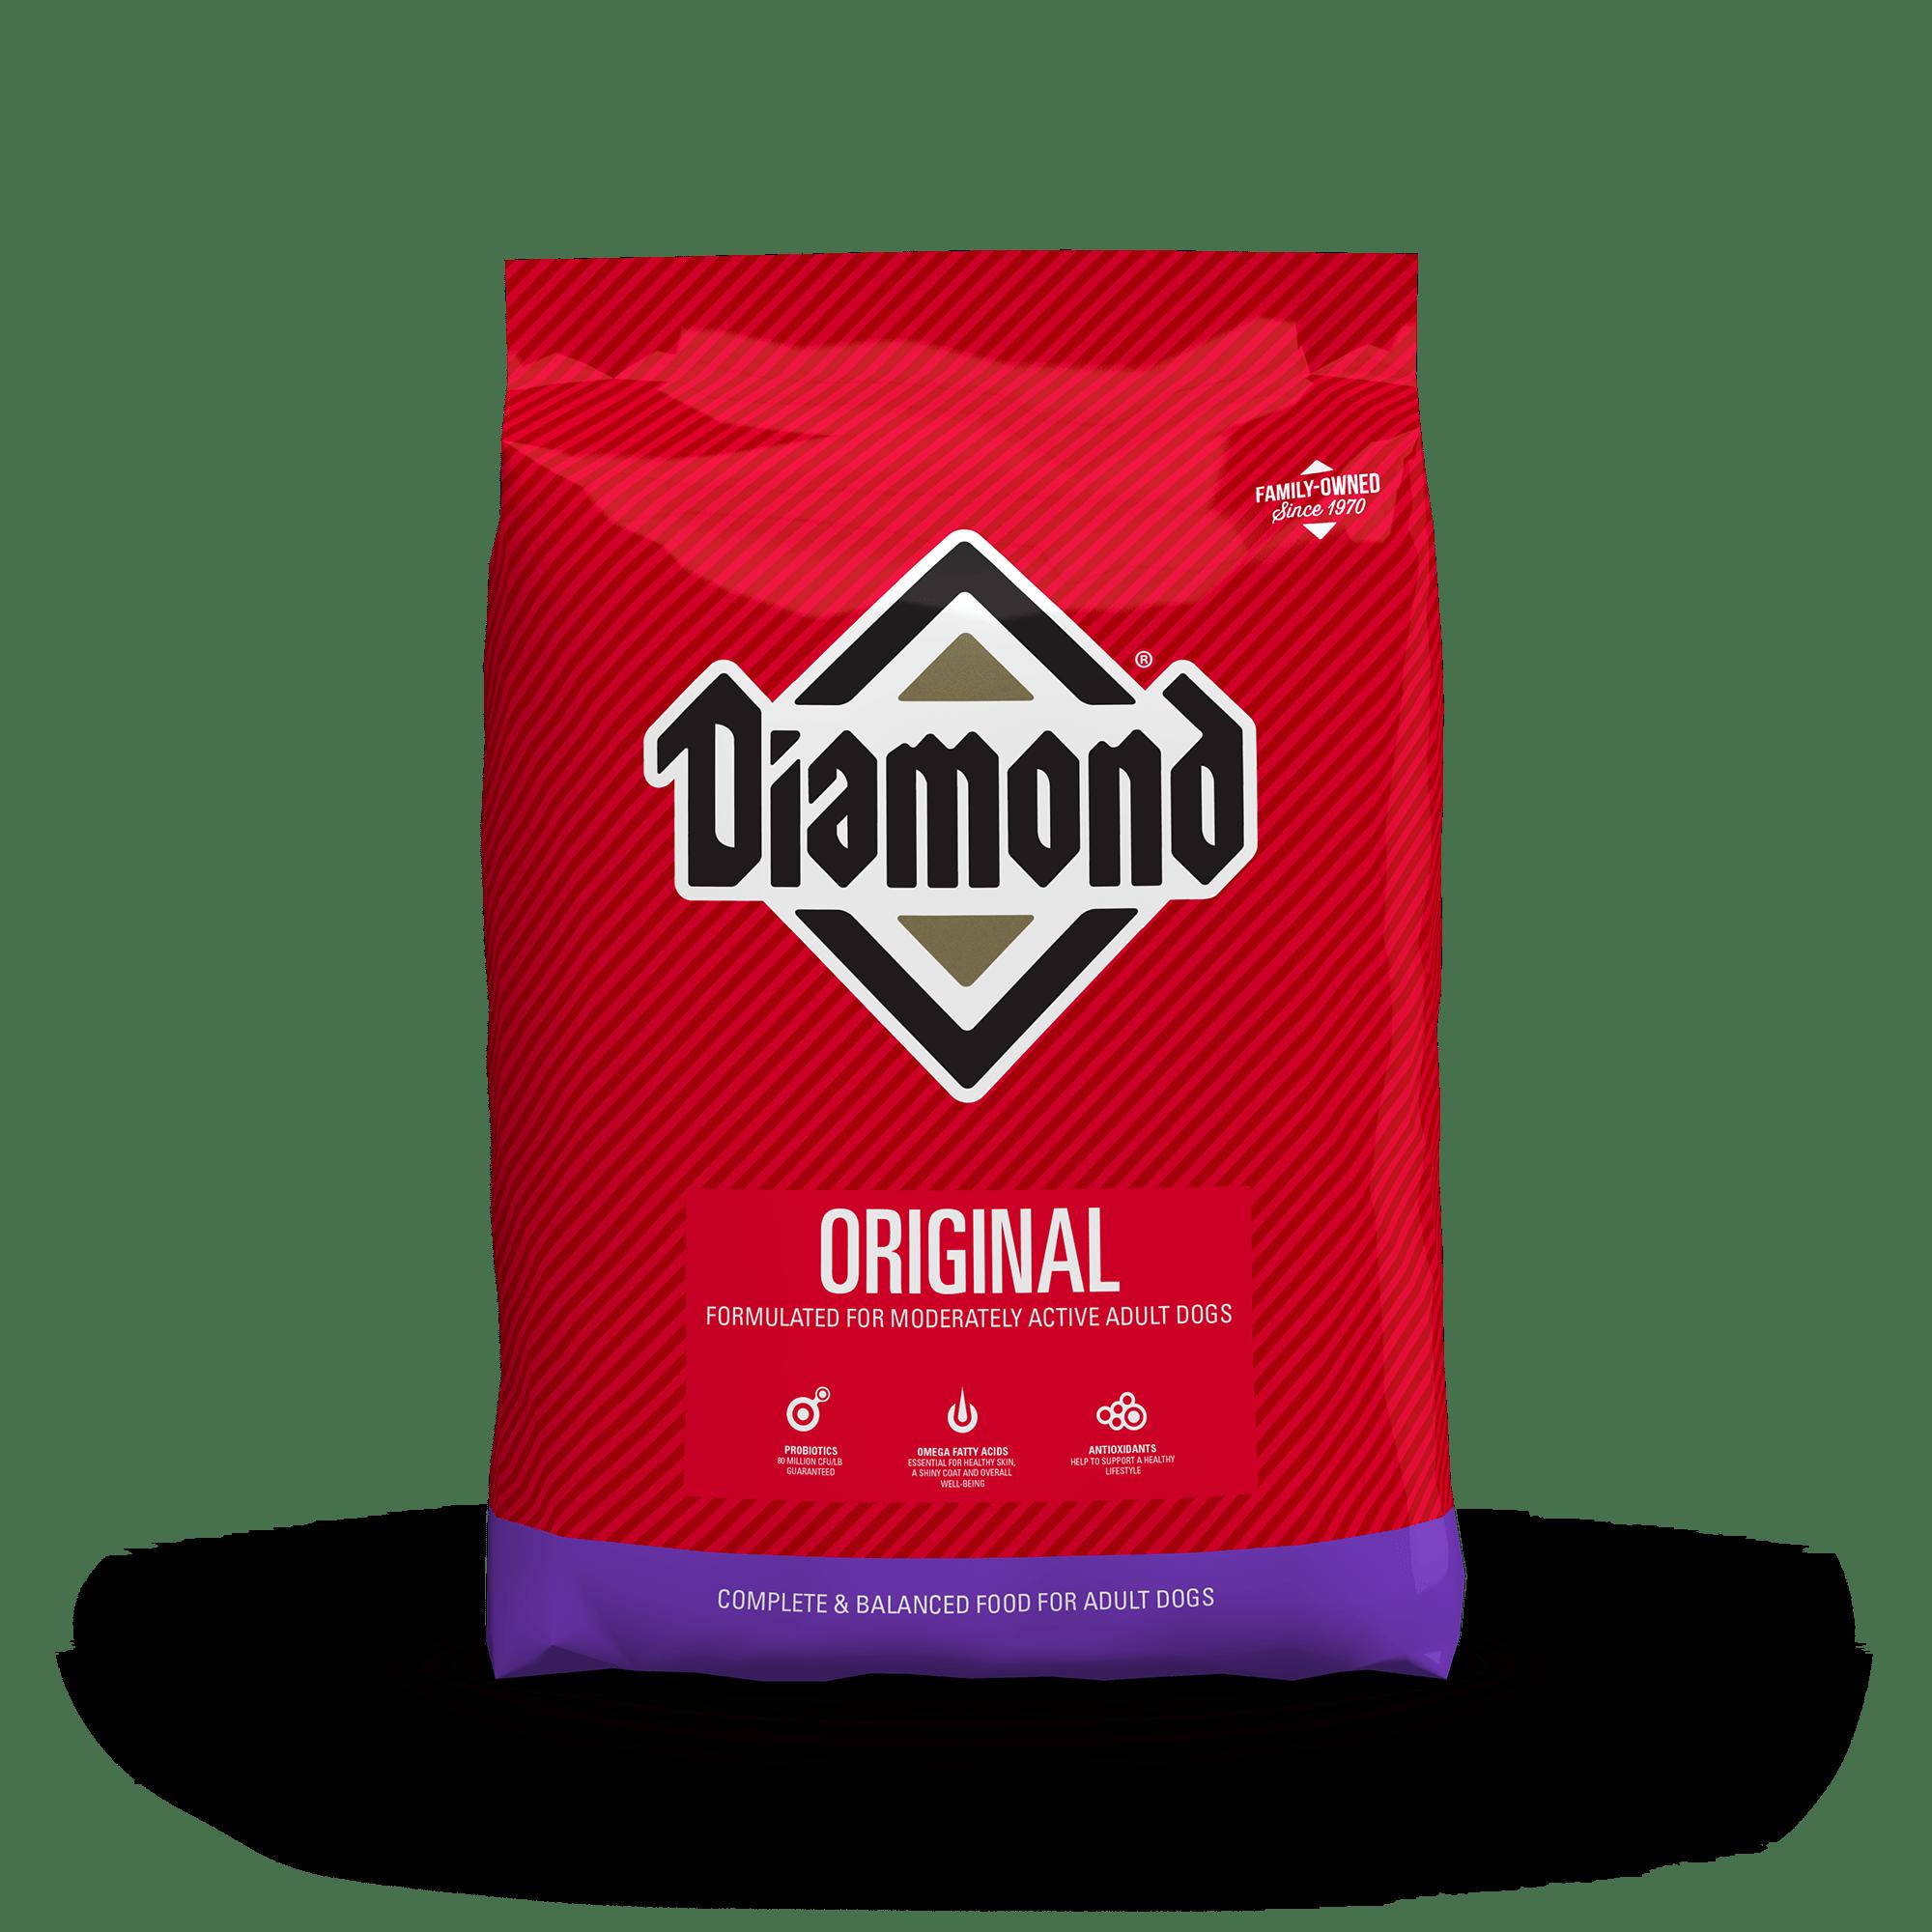 Original product packaging